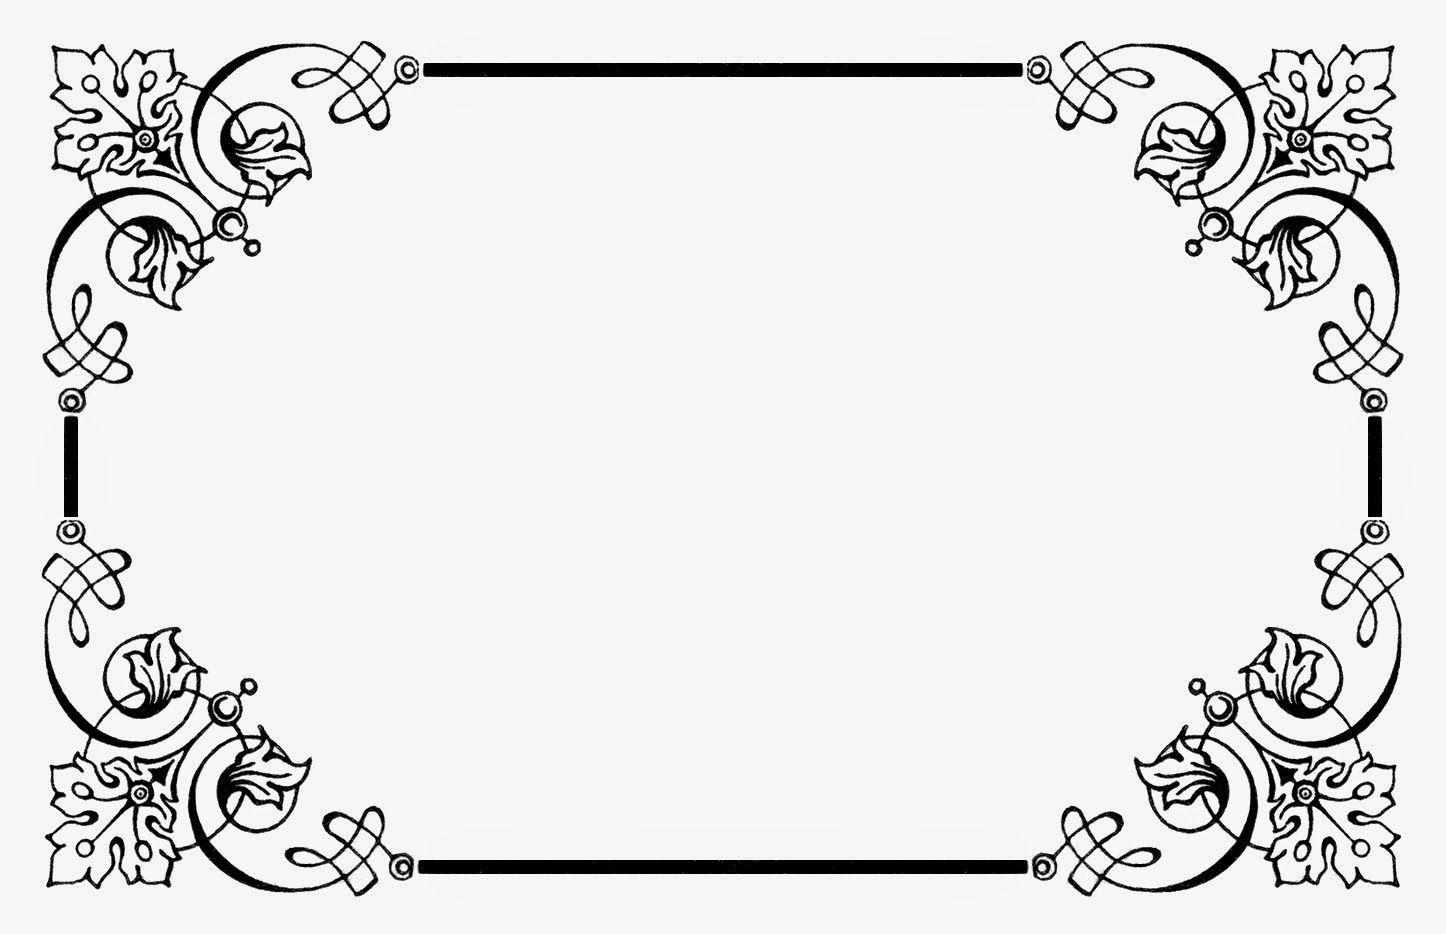 Image Result For Bingkai Cantik Clip Art Vintage Desain Bingkai Doodle Frames